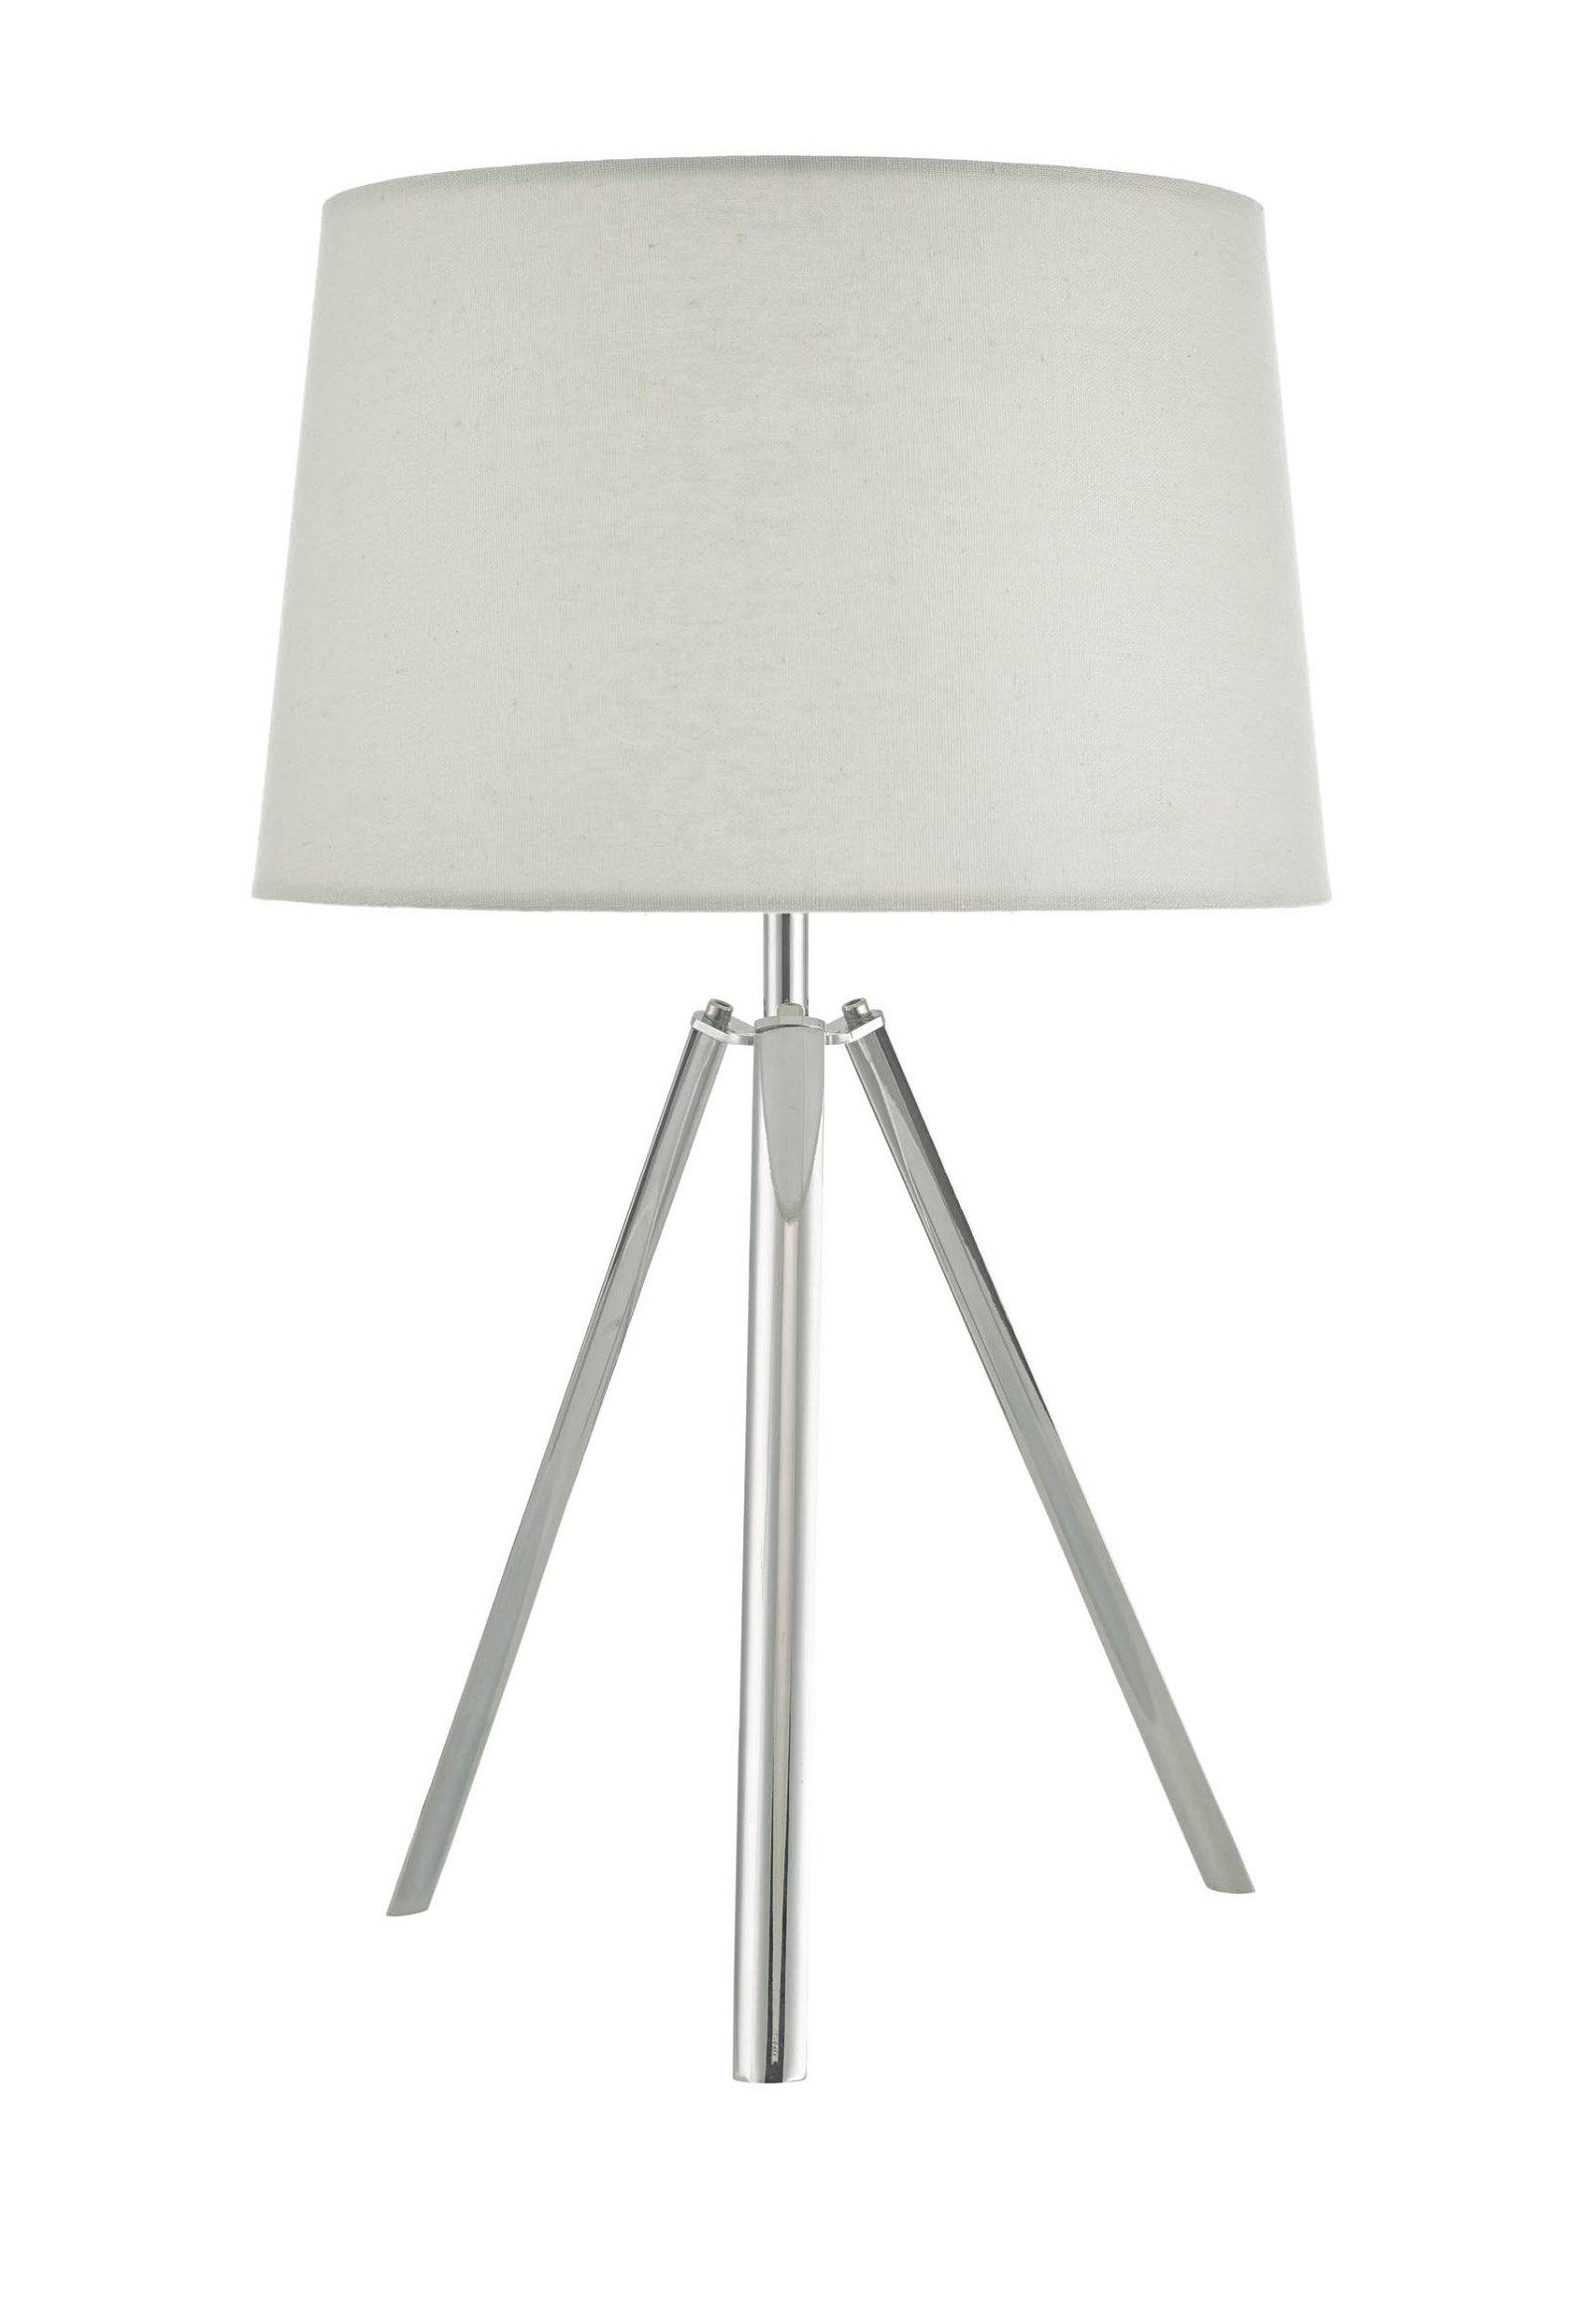 Light Grey Bedside Table: Pair Modern Chrome 50cm Tripod Table Lamps Bedside Light